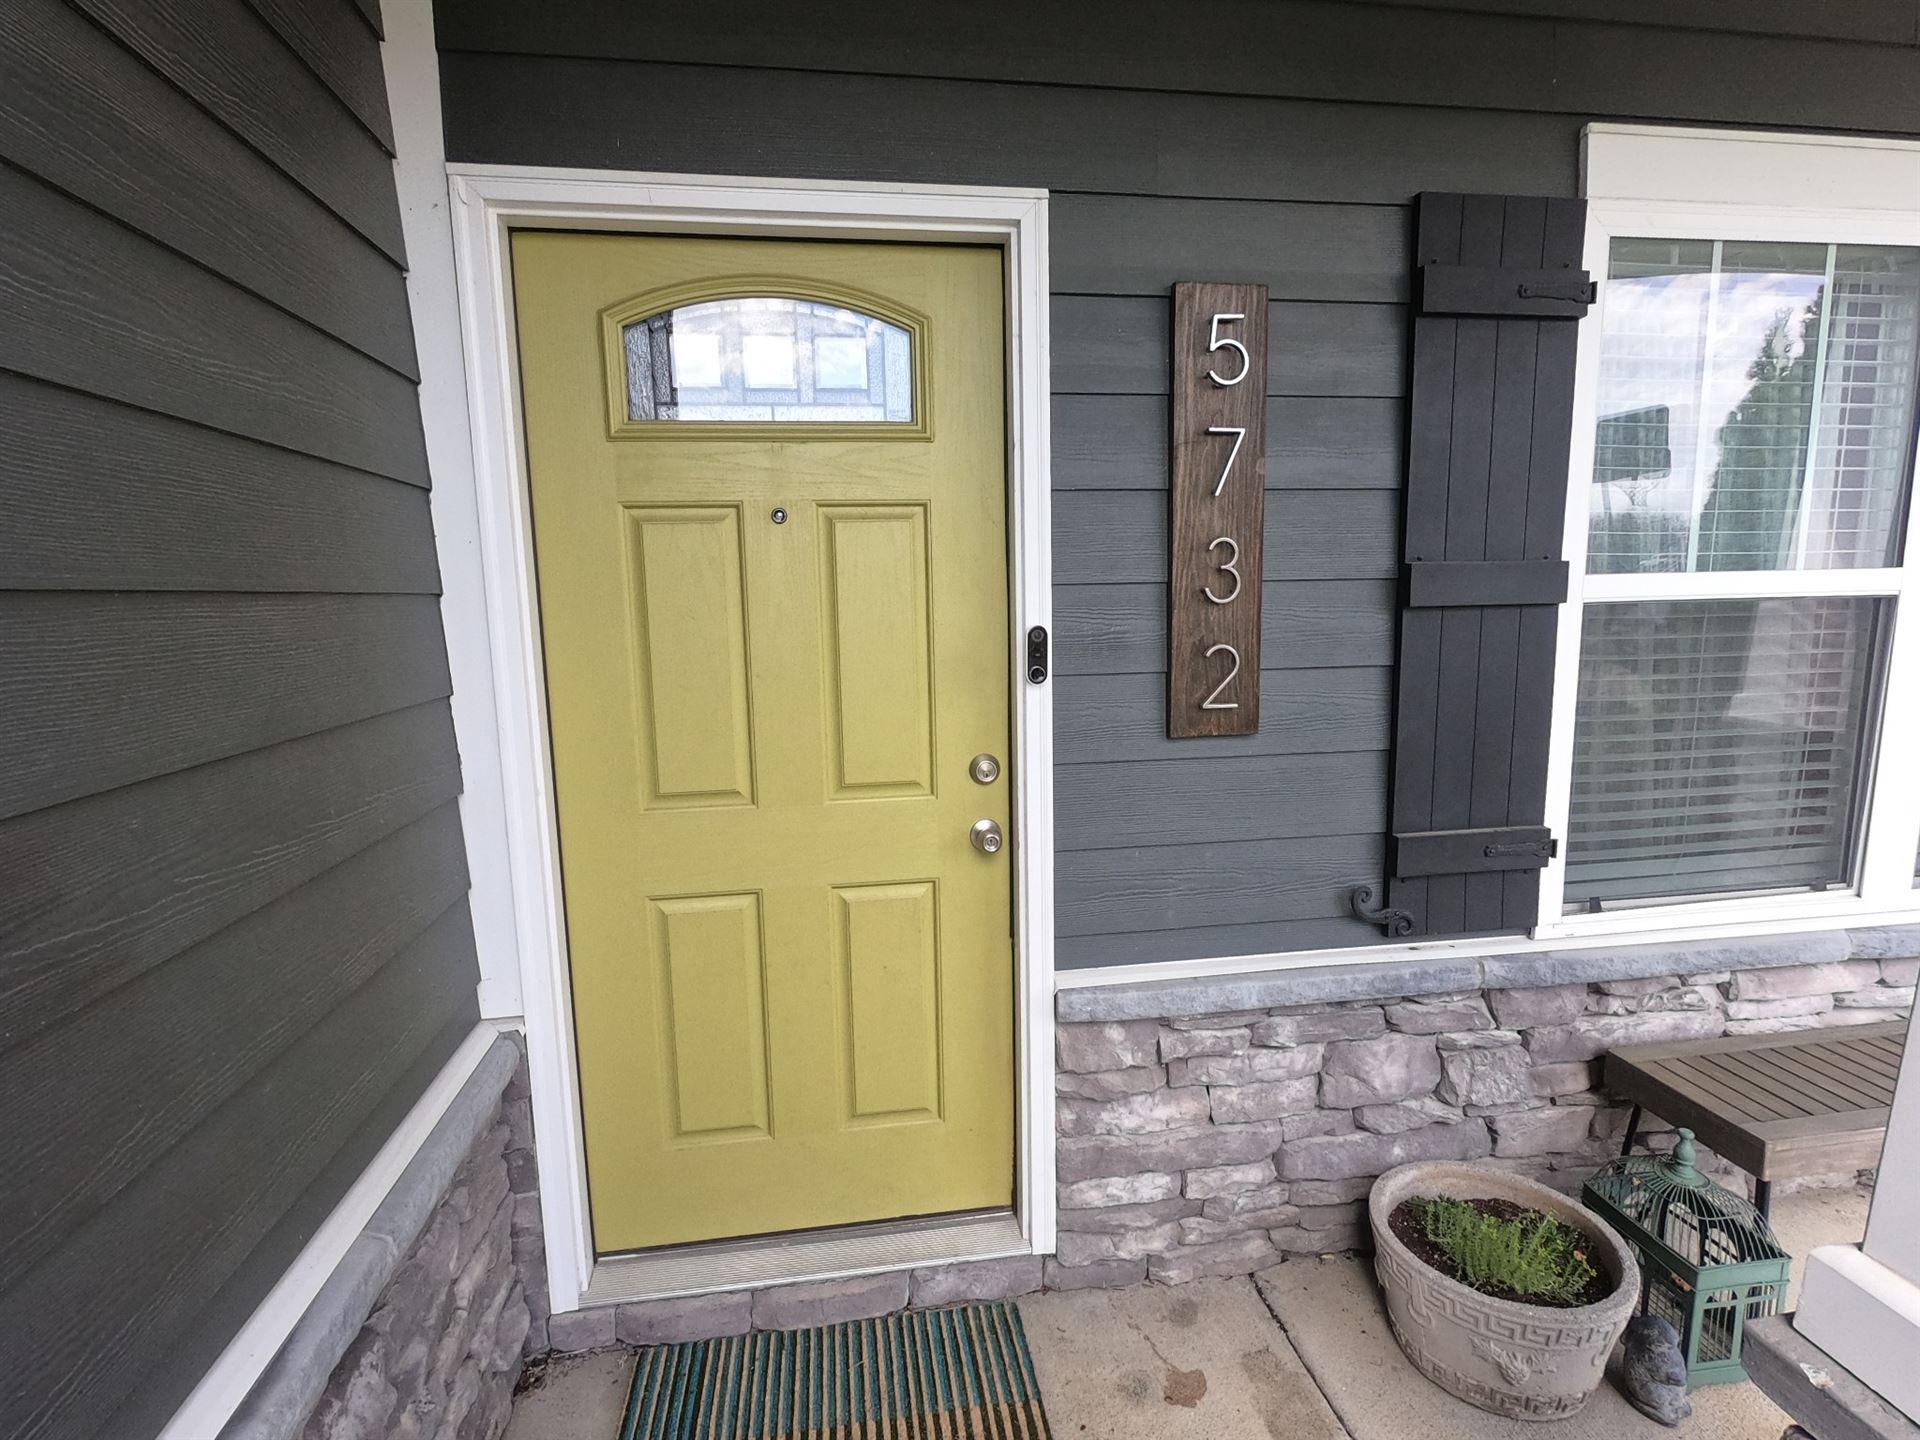 Photo of 5732 Enclave Dr, Murfreesboro, TN 37128 (MLS # 2243309)